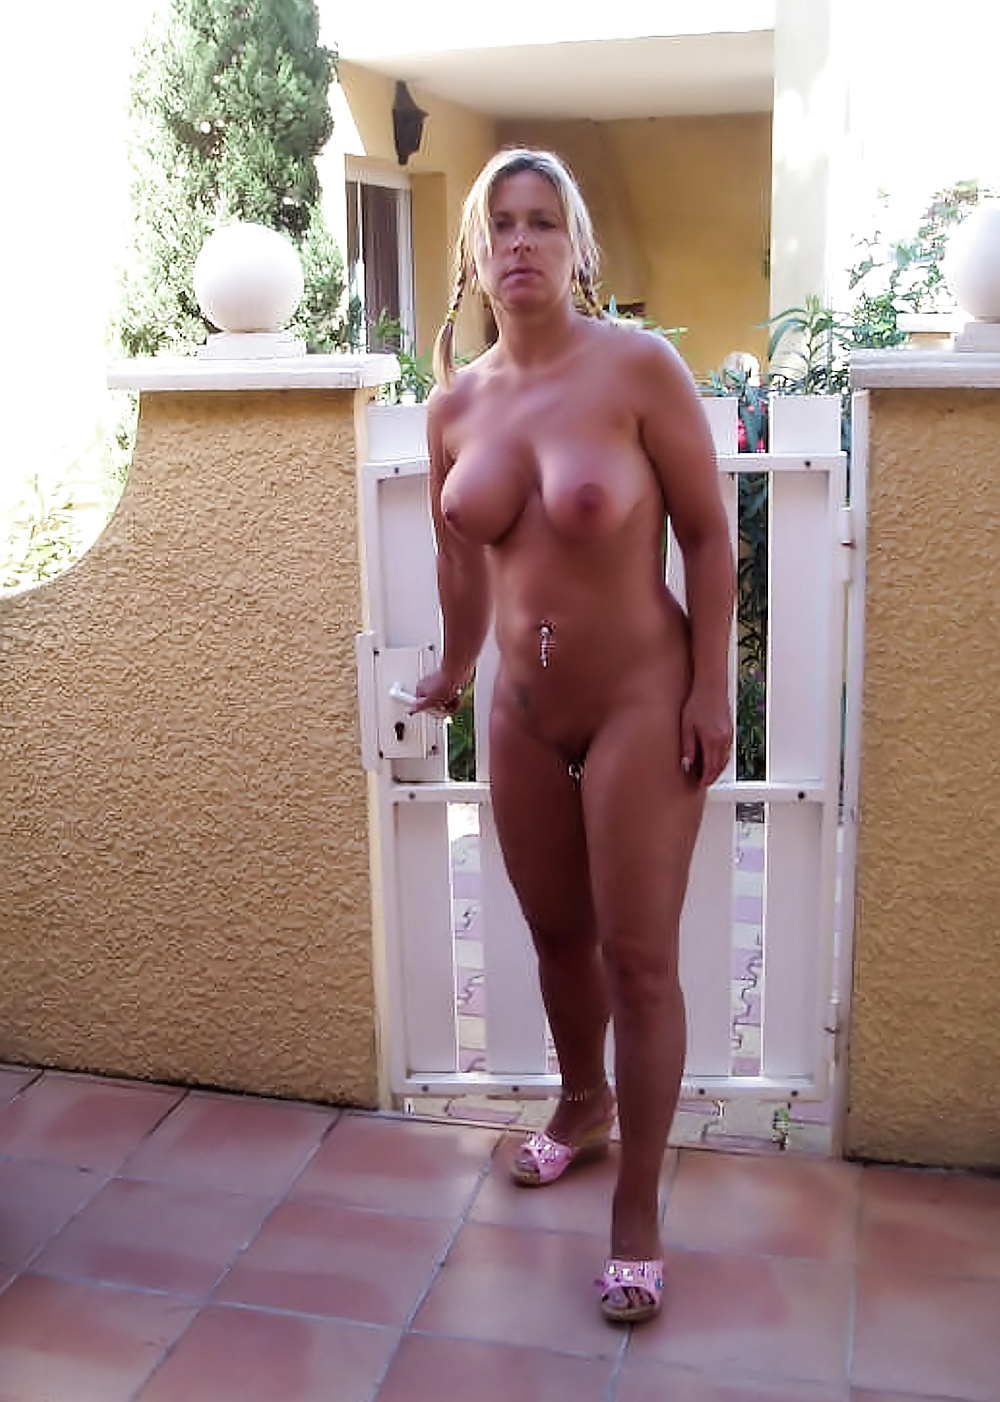 Mom walking around the house nude, robin wrig